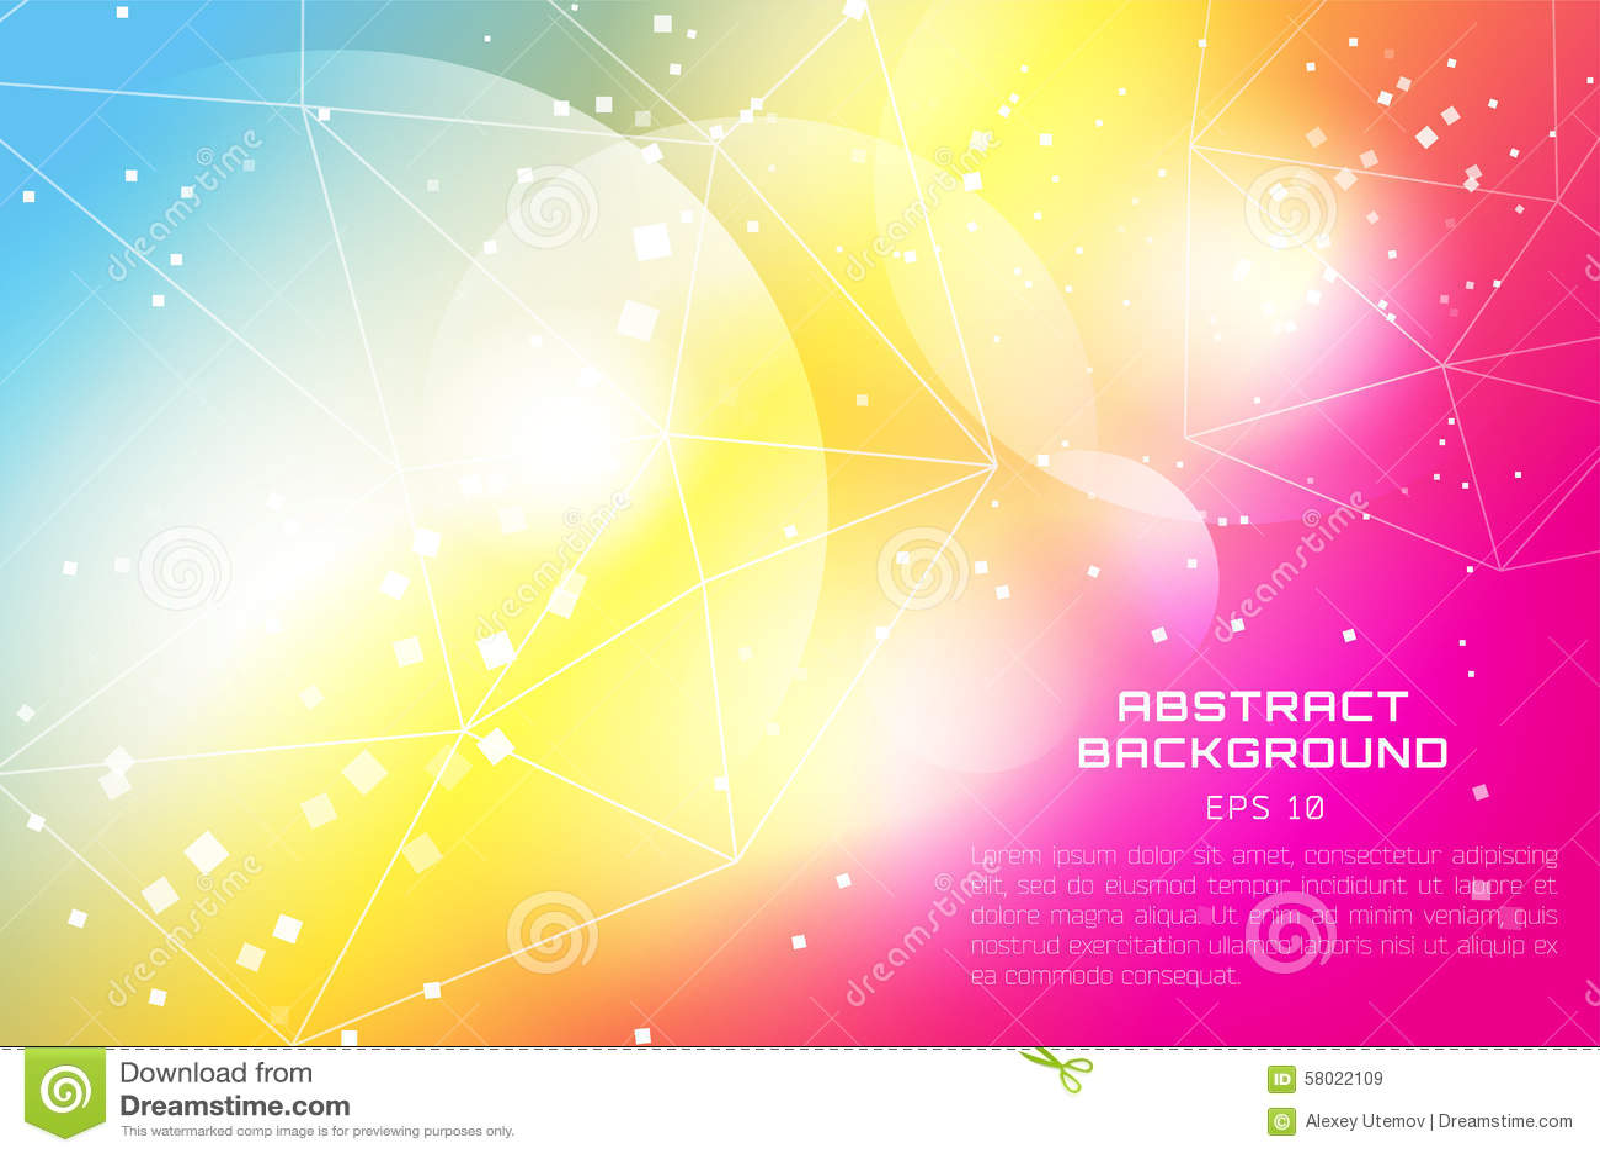 abstract background design shine glow background illustration